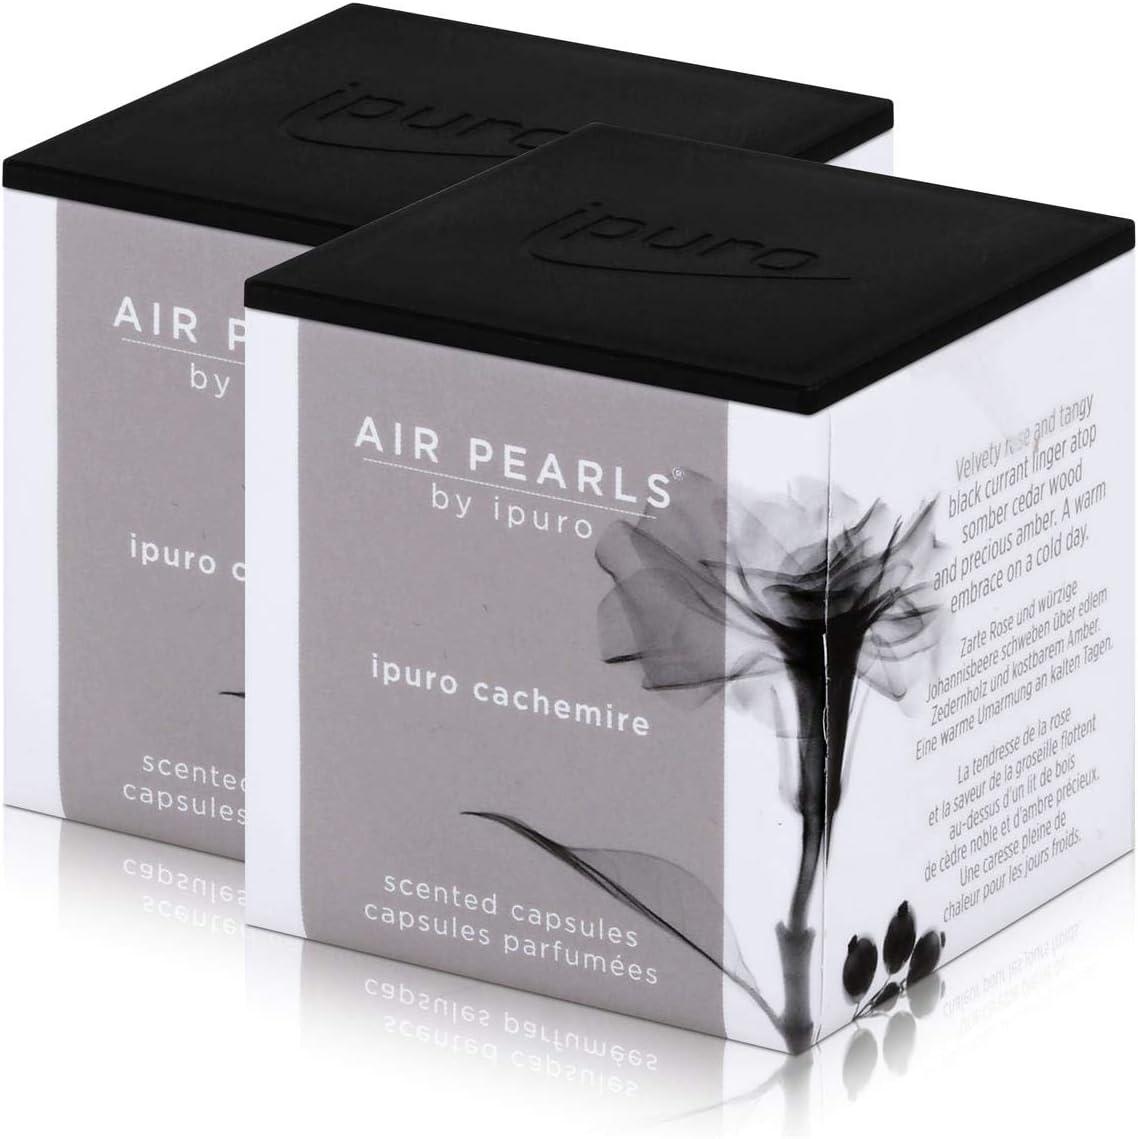 Air Pearls by ipuro cachemire - Cápsulas aromáticas (2 x 5,75 g, aroma a grosella y rosa dulce, flota sobre madera de cedro y ámbar precioso (2 unidades): Amazon.es: Hogar